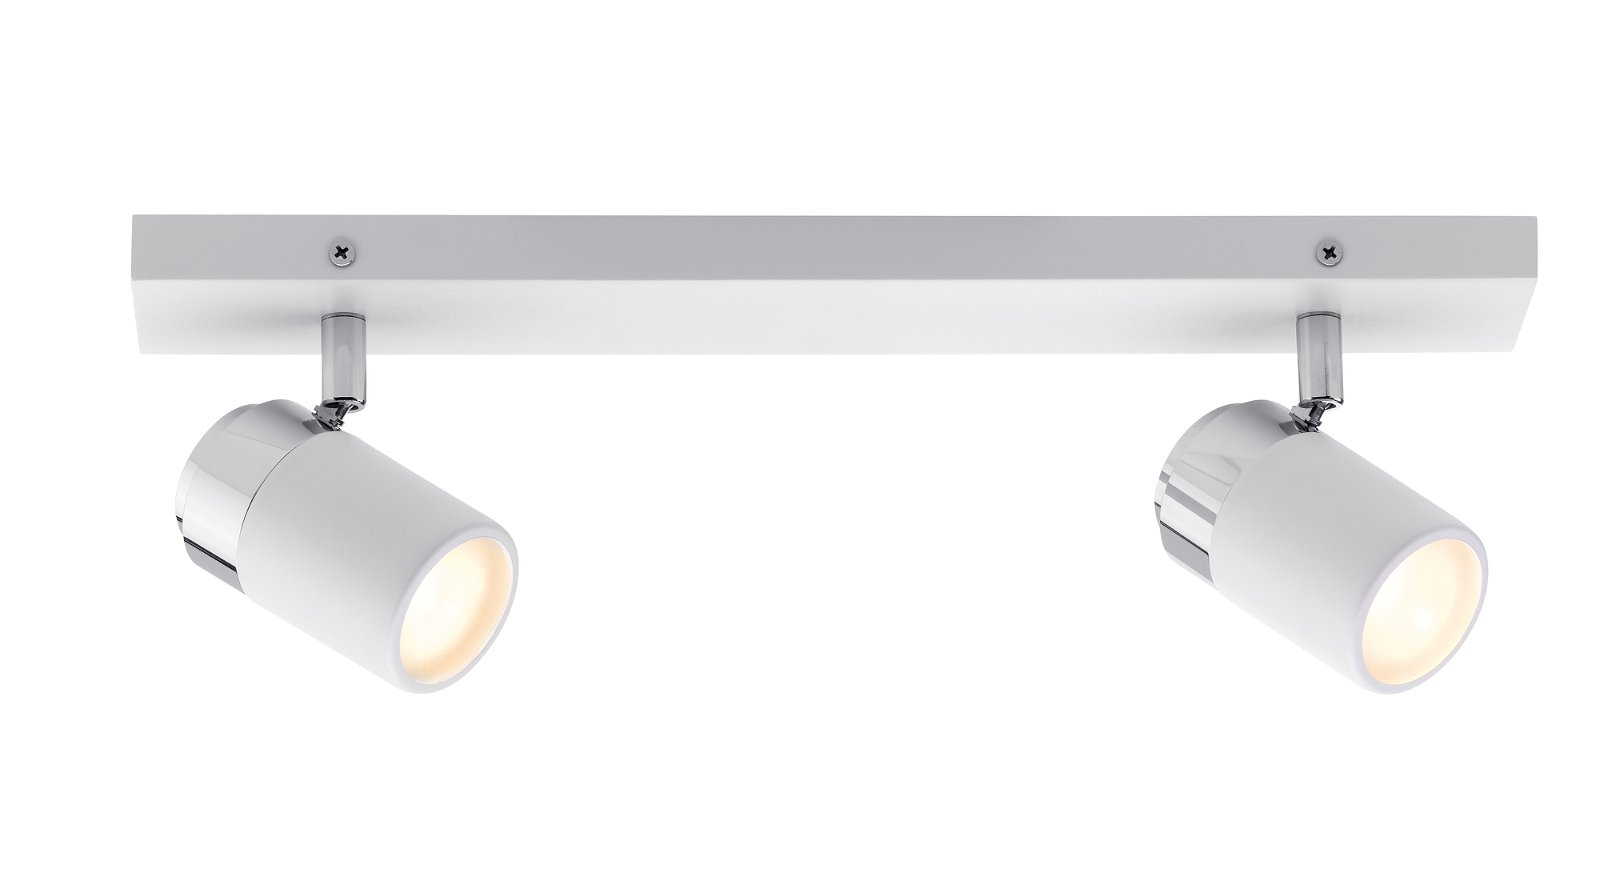 Spot de plafond Zyli IP44 GU10 230V max. 2x10W Blanc/Chrome